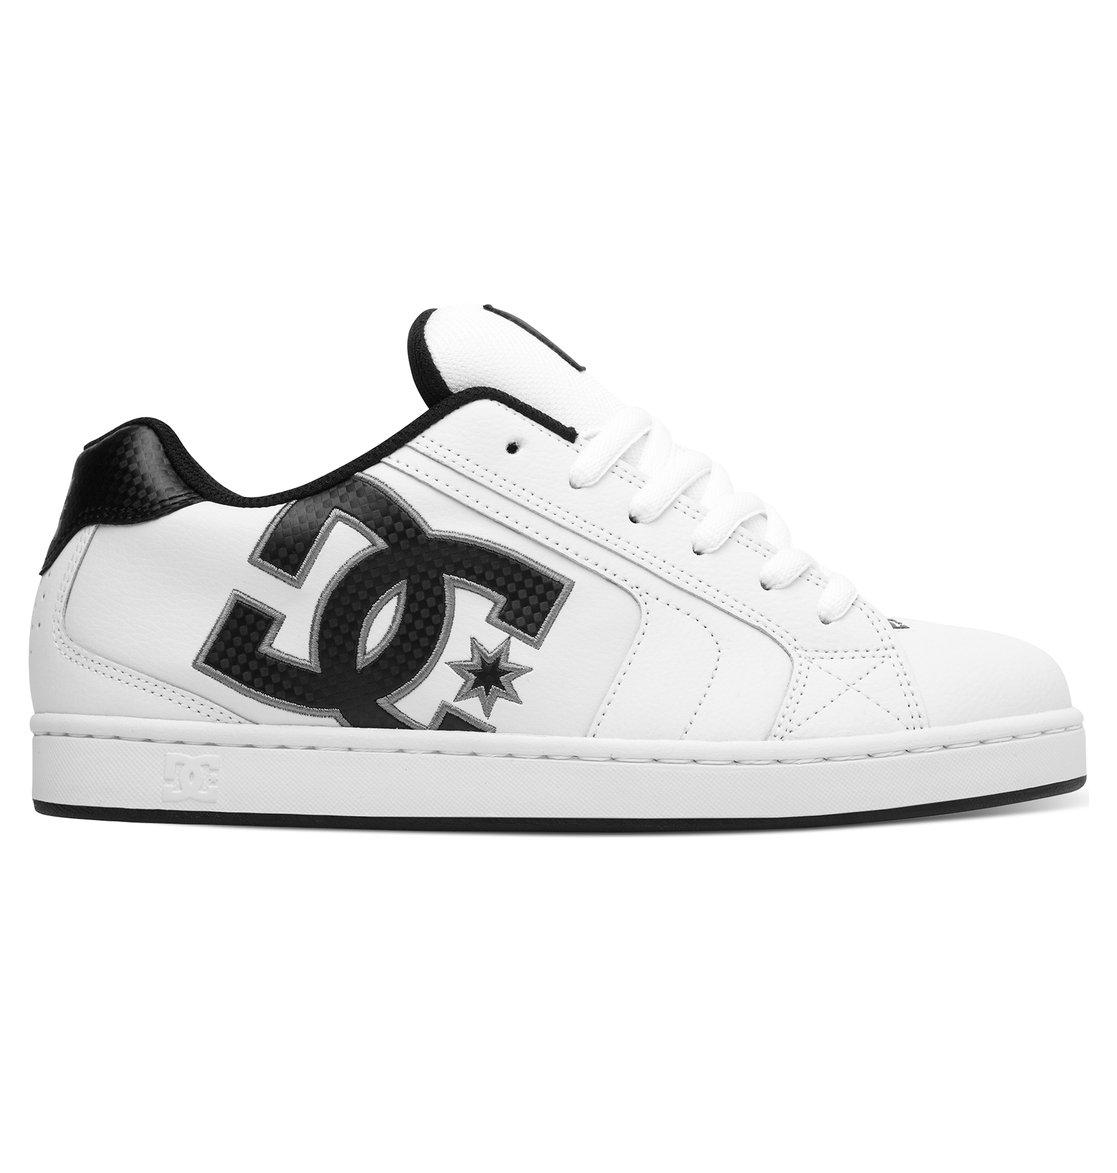 Net - Chaussures basses pour homme - DC Shoes